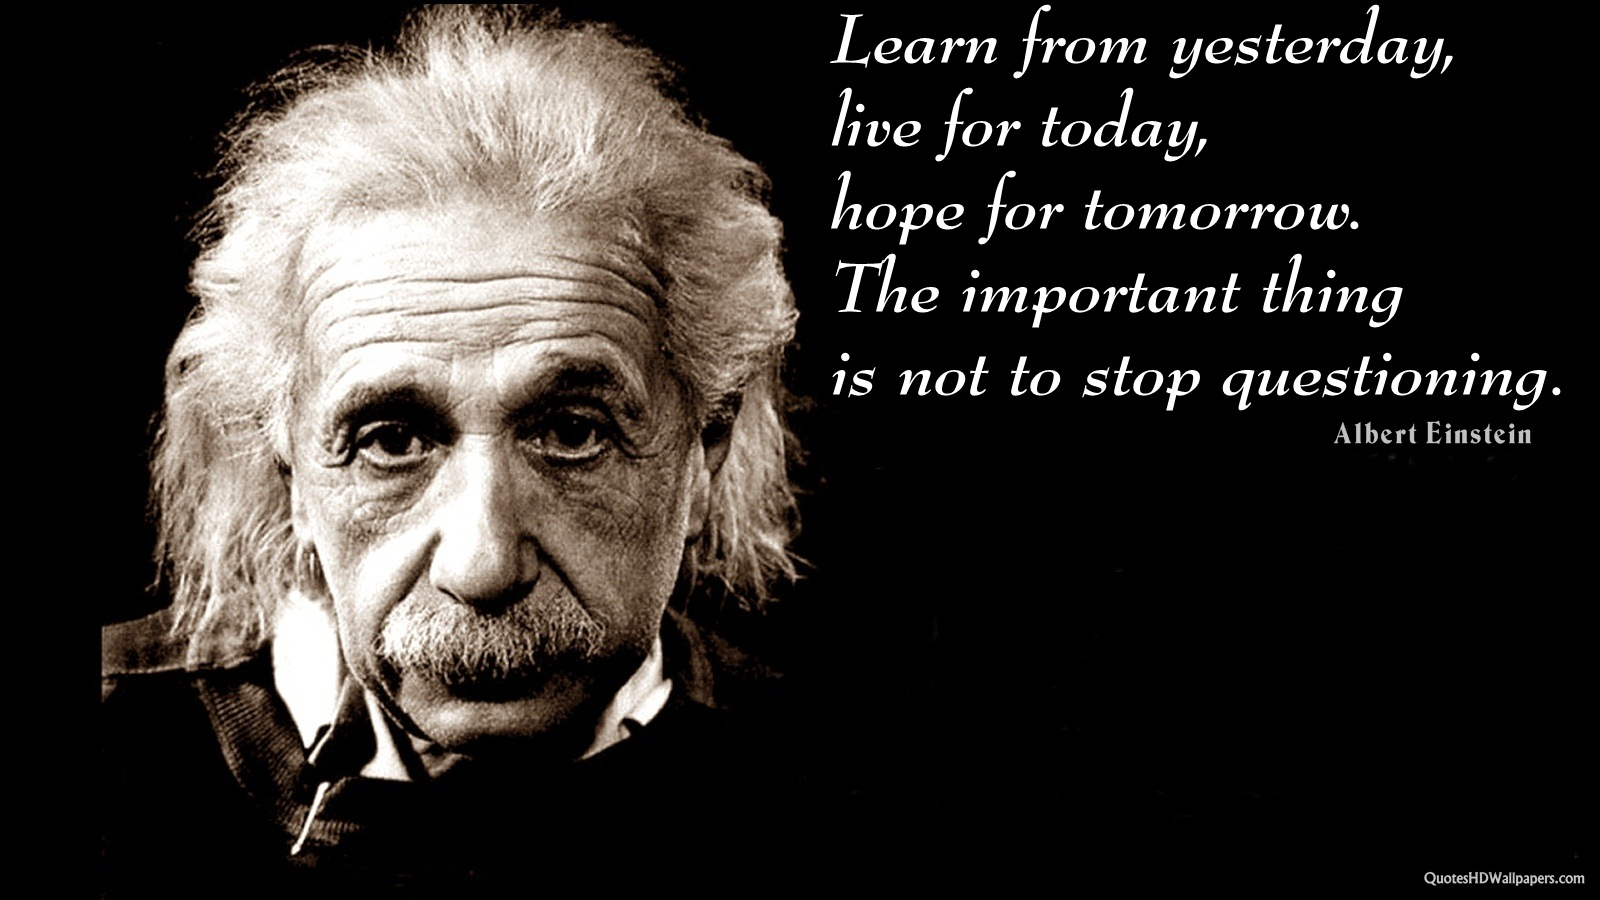 Albert Einstein Quotes Wallpaper Hd. QuotesGram